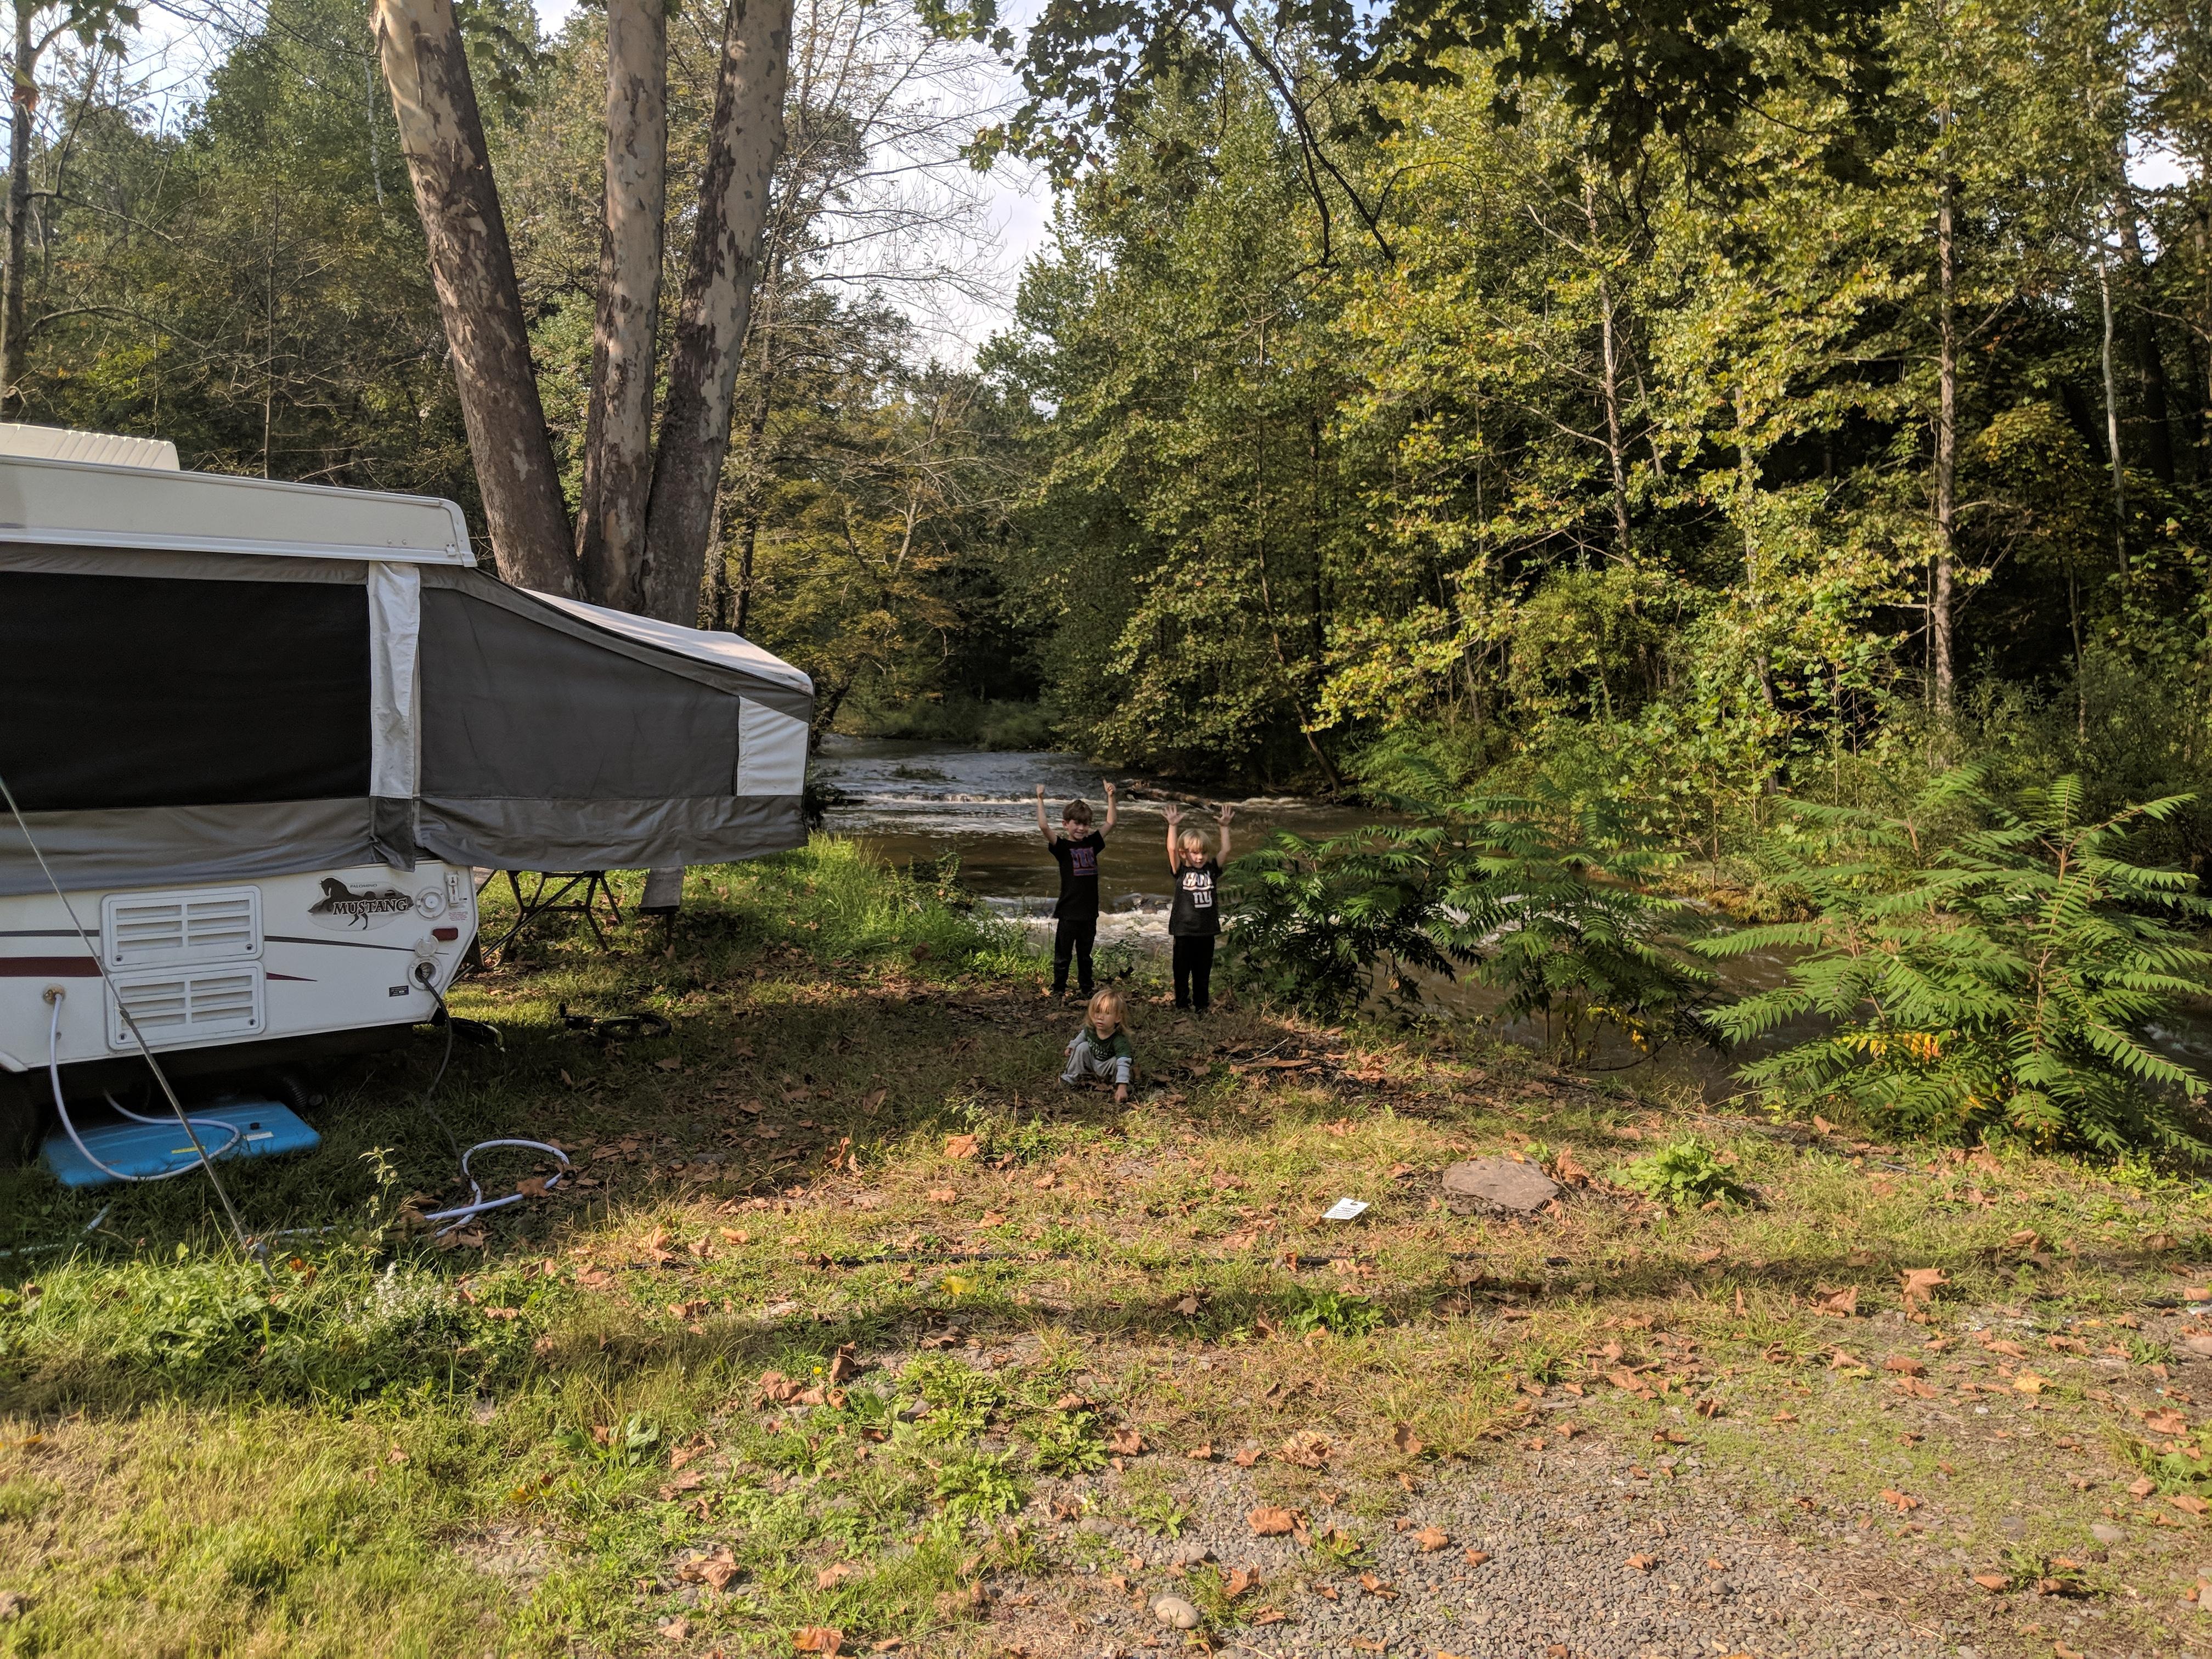 Camping In The Rain Full Time In A Pop Up Camper - Embracing